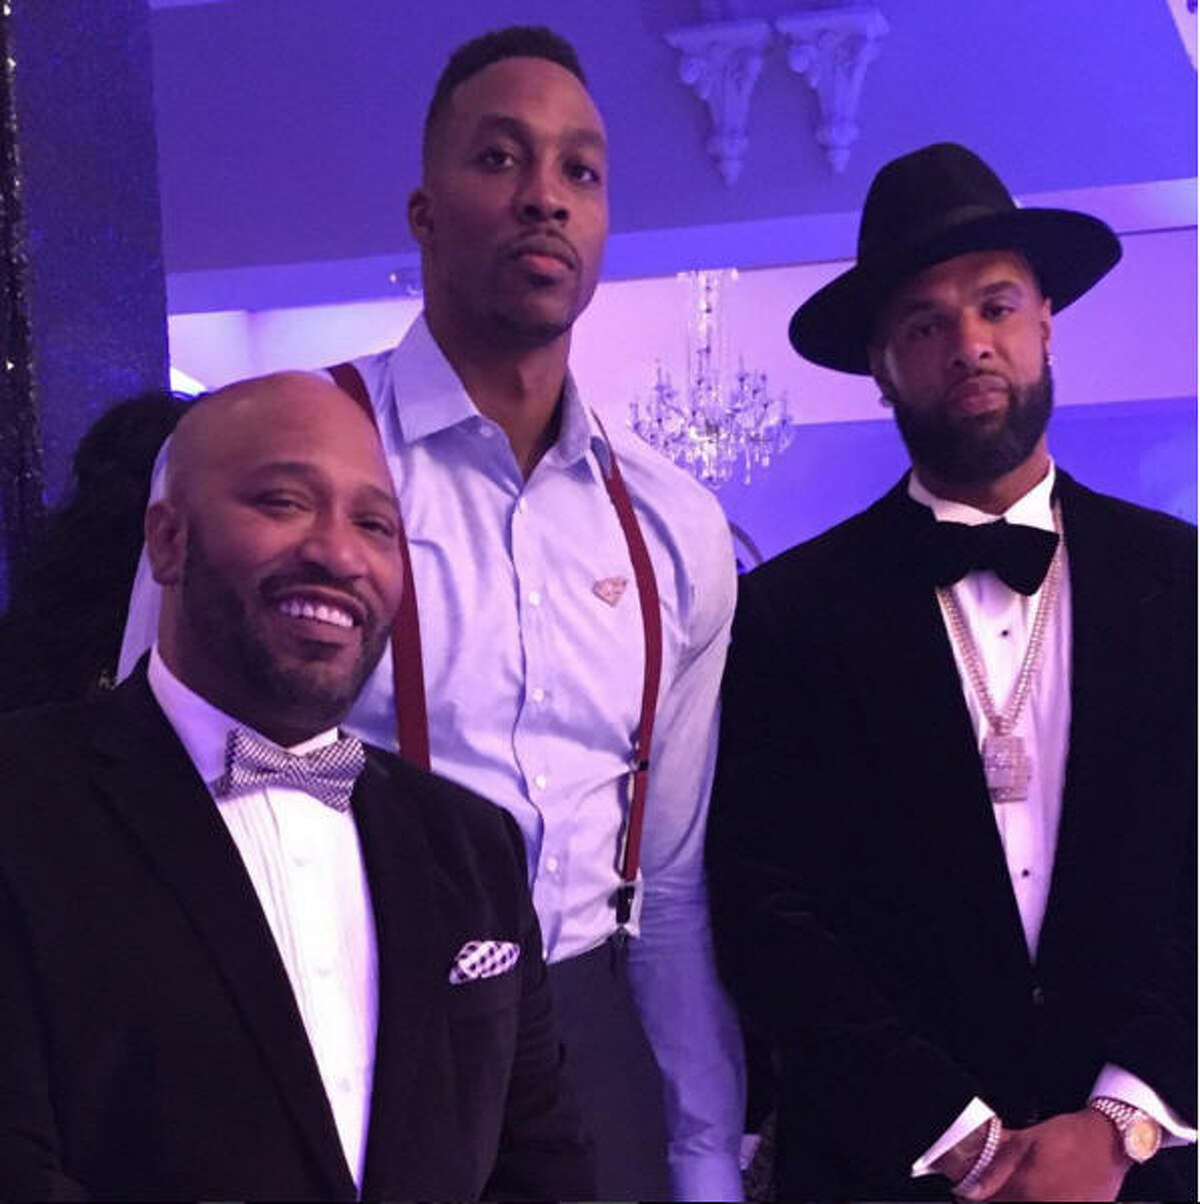 Dwight Howard celebrates his 30th birthday with Bun B and Slim Thug.